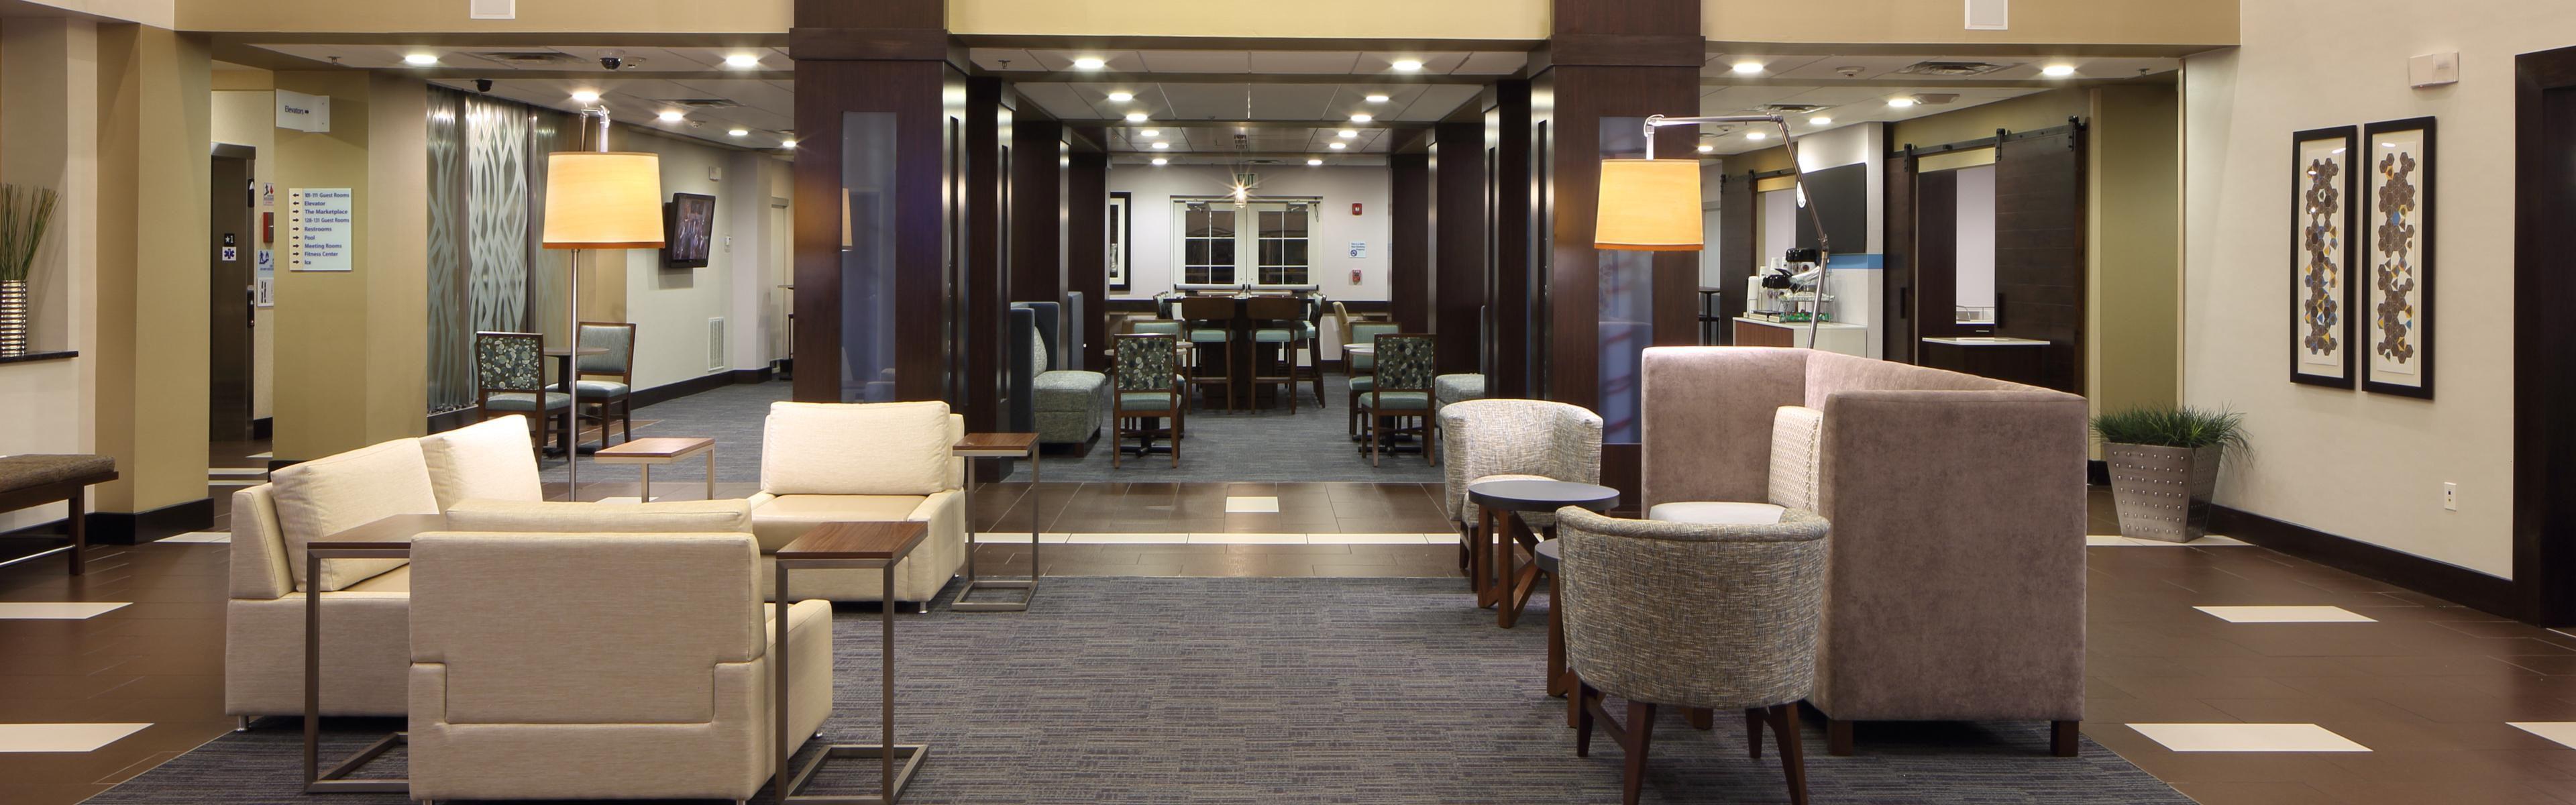 Holiday Inn Express & Suites Atlanta Arpt West - Camp Creek image 0